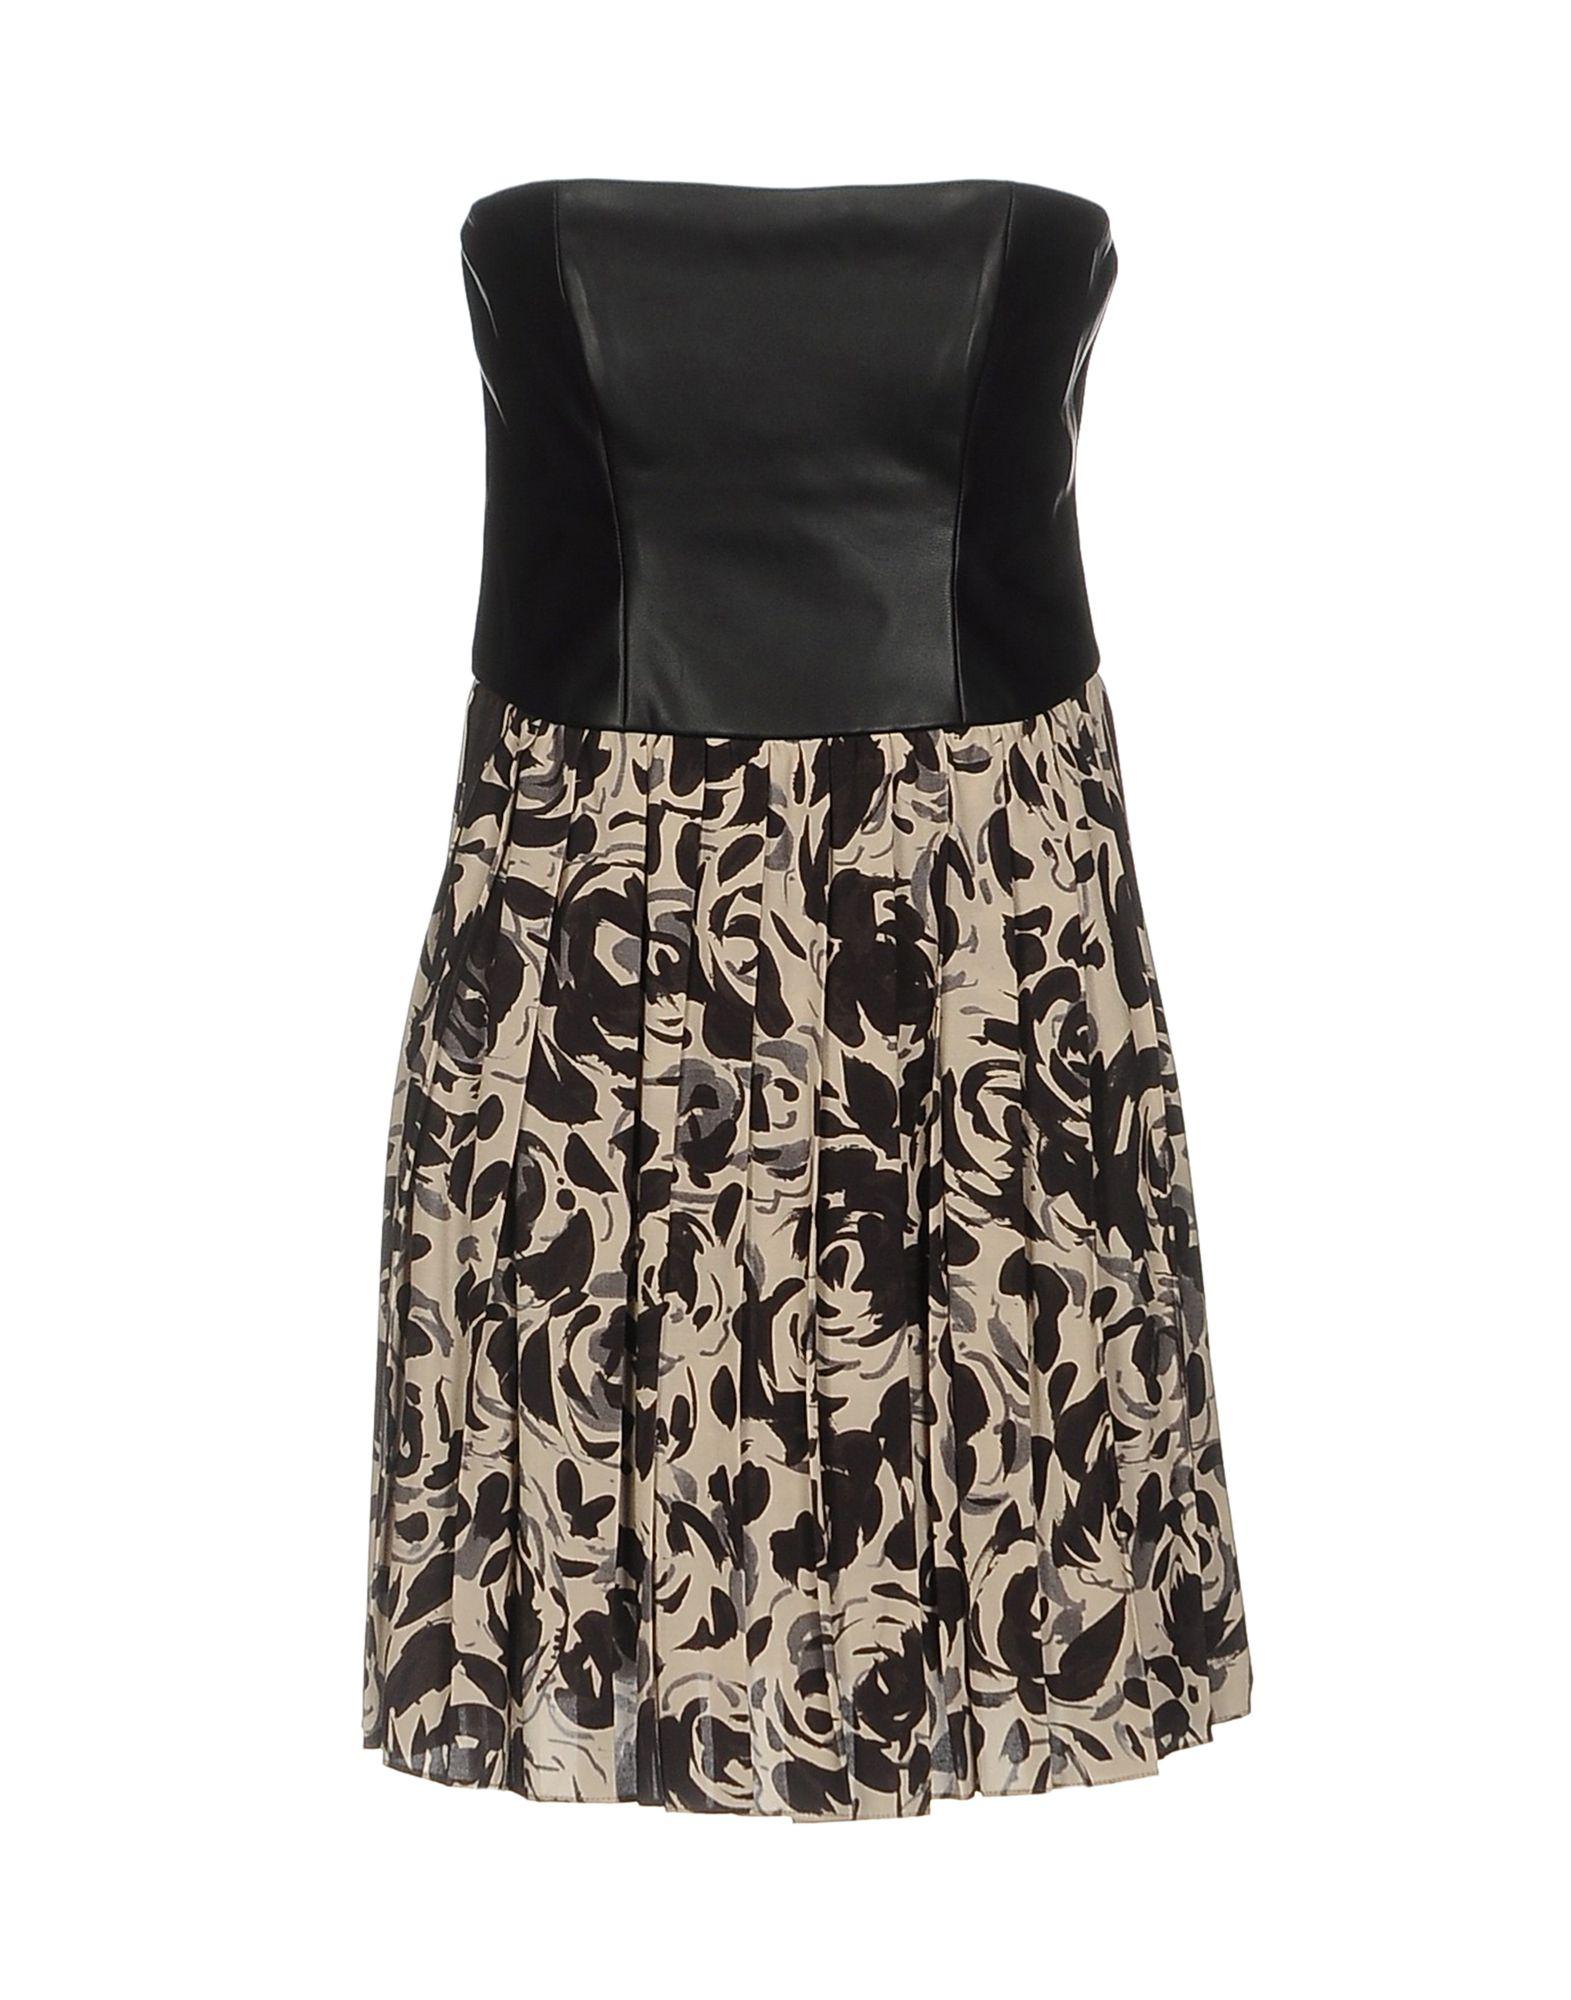 LES COCKTAILS DE LIU •JO Короткое платье les cocktails de liu •jo длинное платье